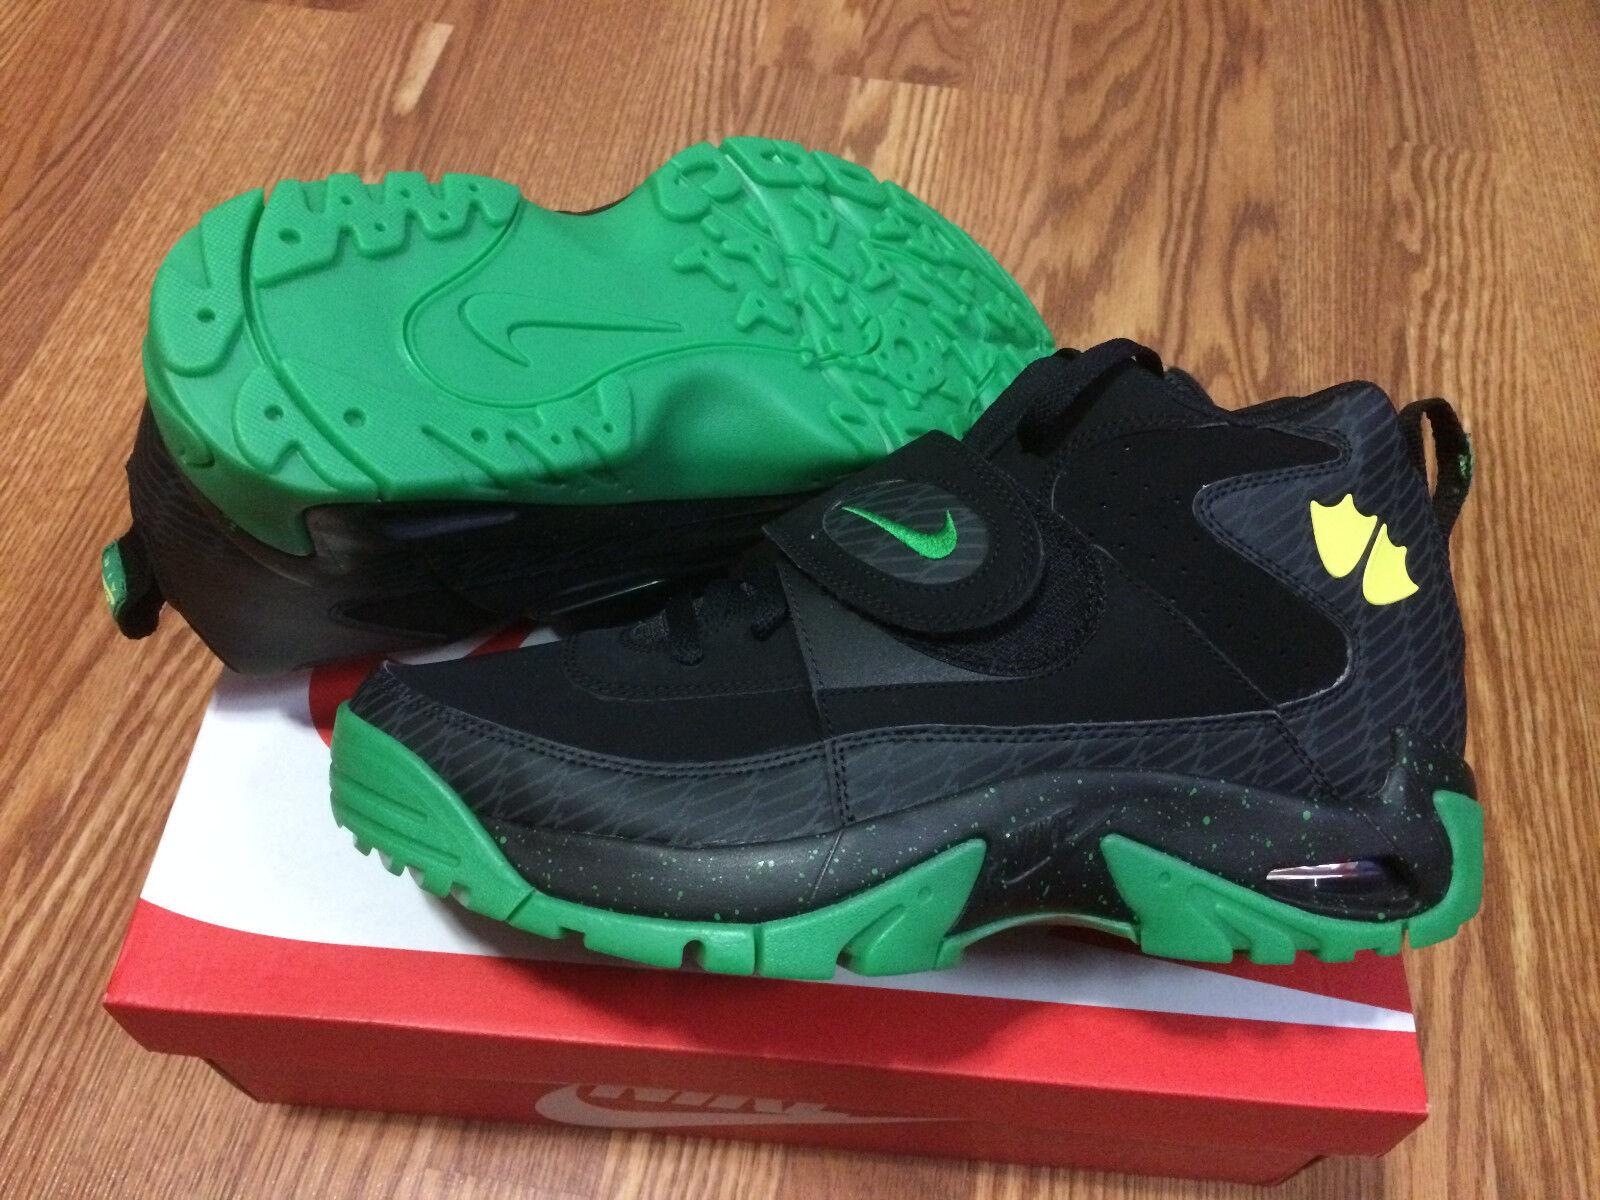 Nike Air Mission PRM Oregon Ducks PE QS Apple Green Yellow 644103 001 Size 12